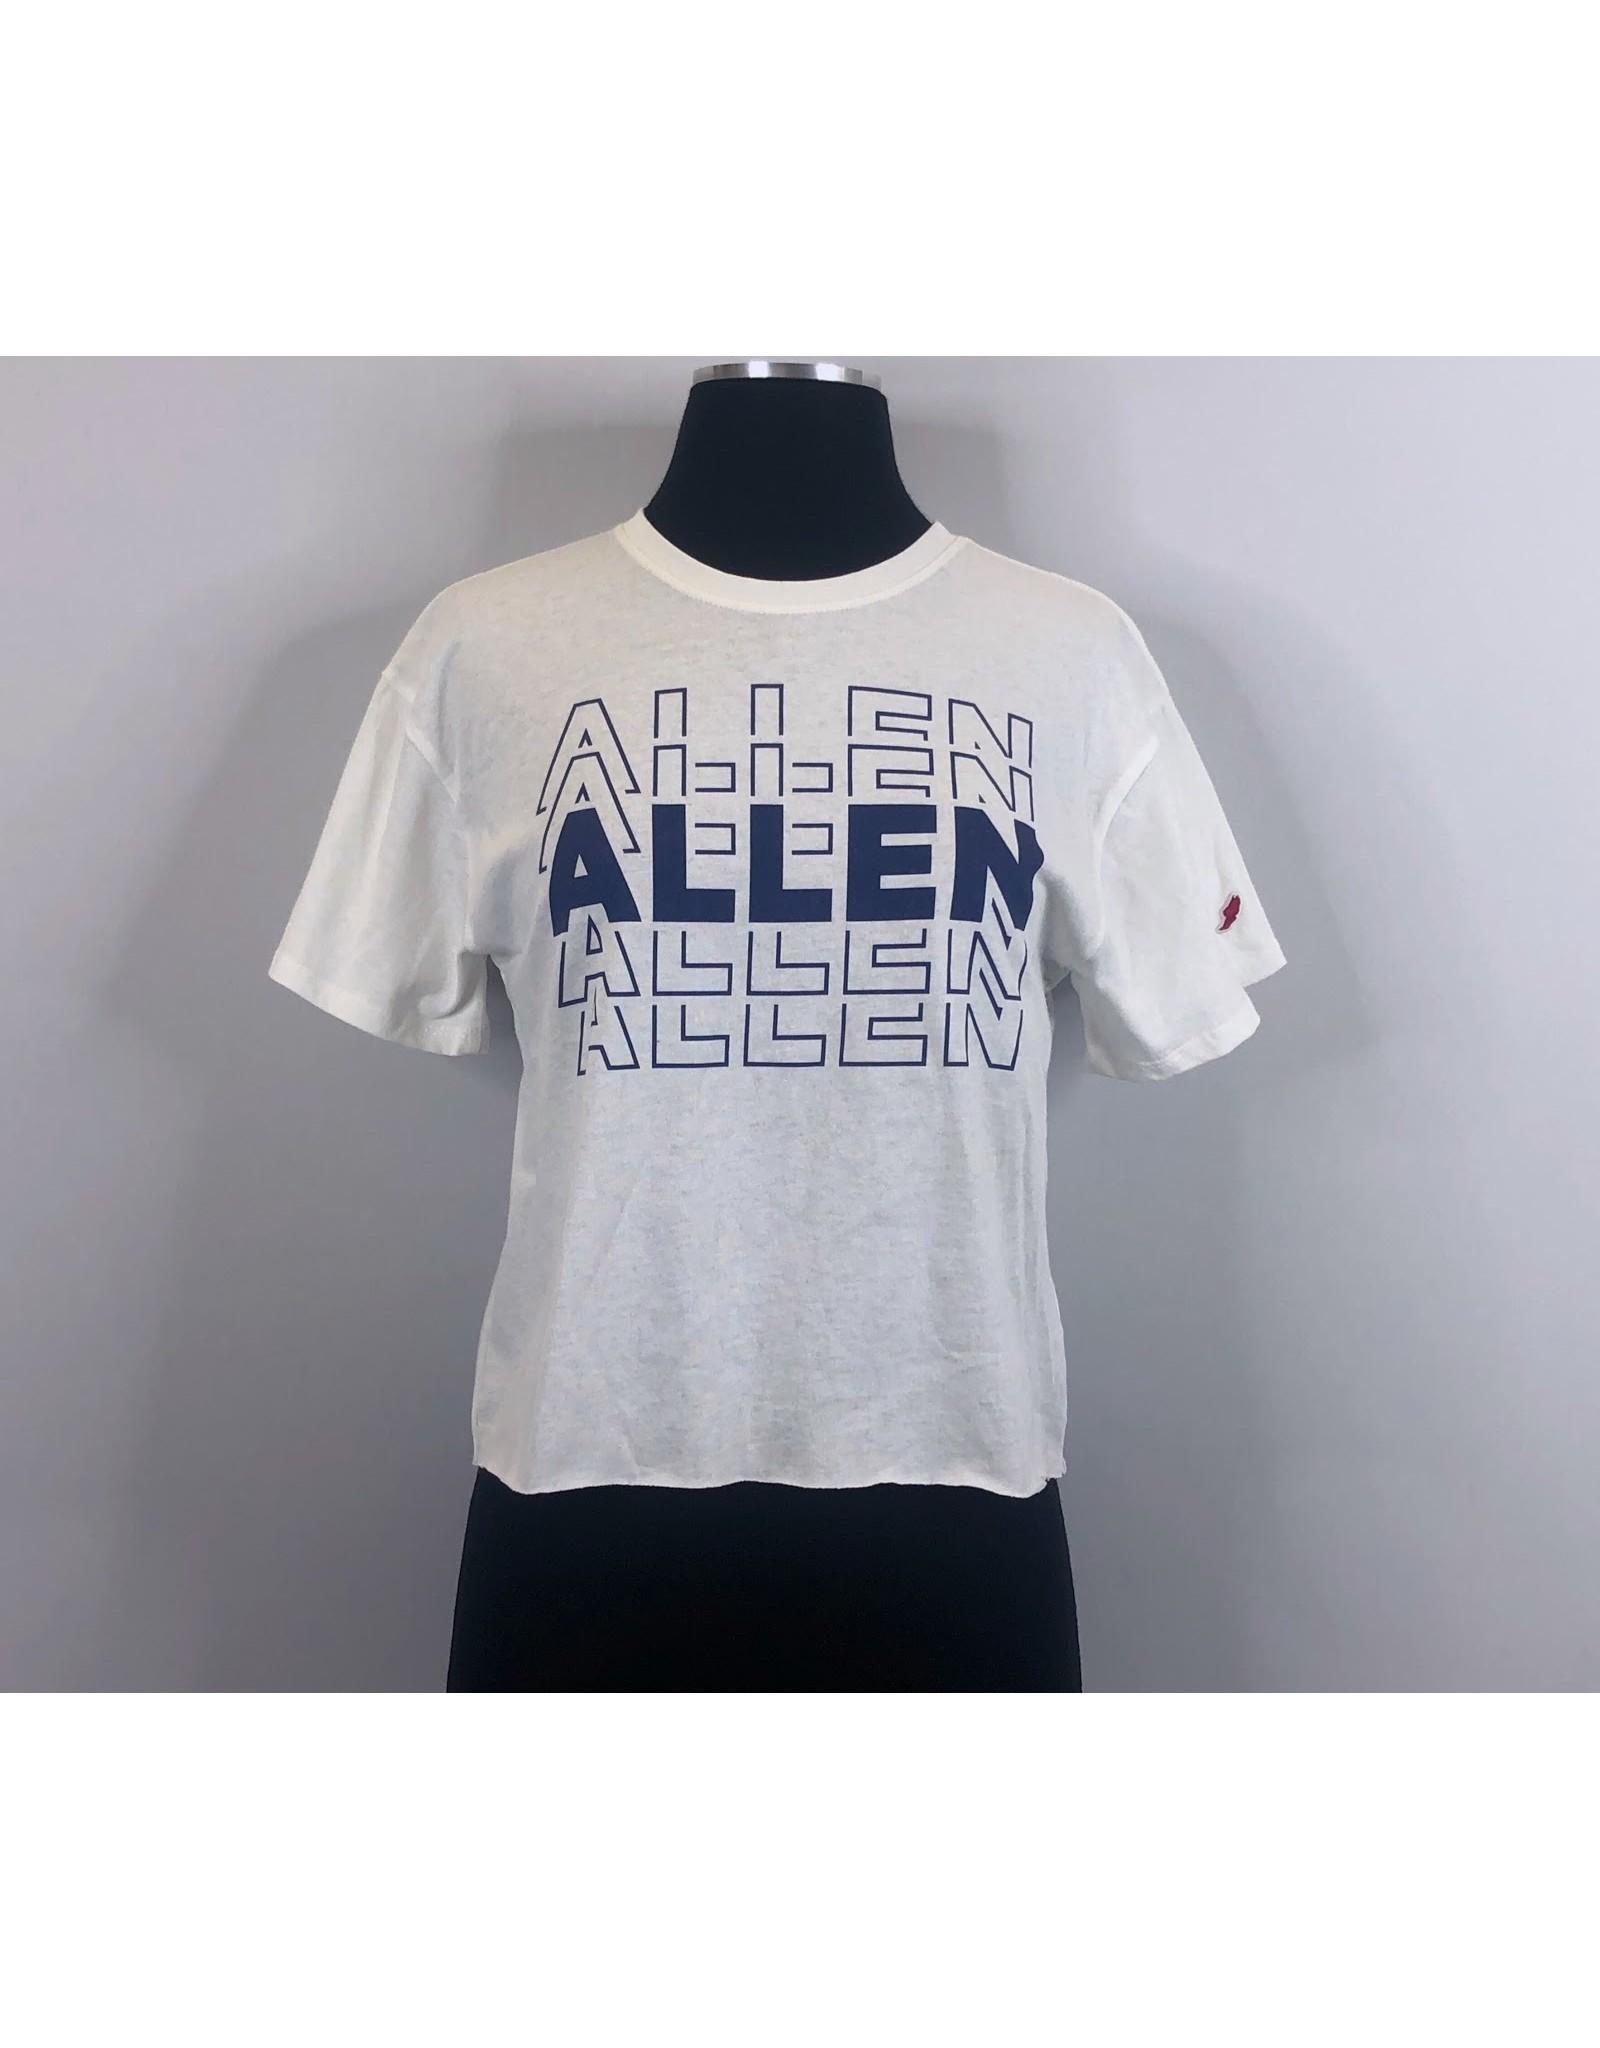 League Clothesline Crop Top